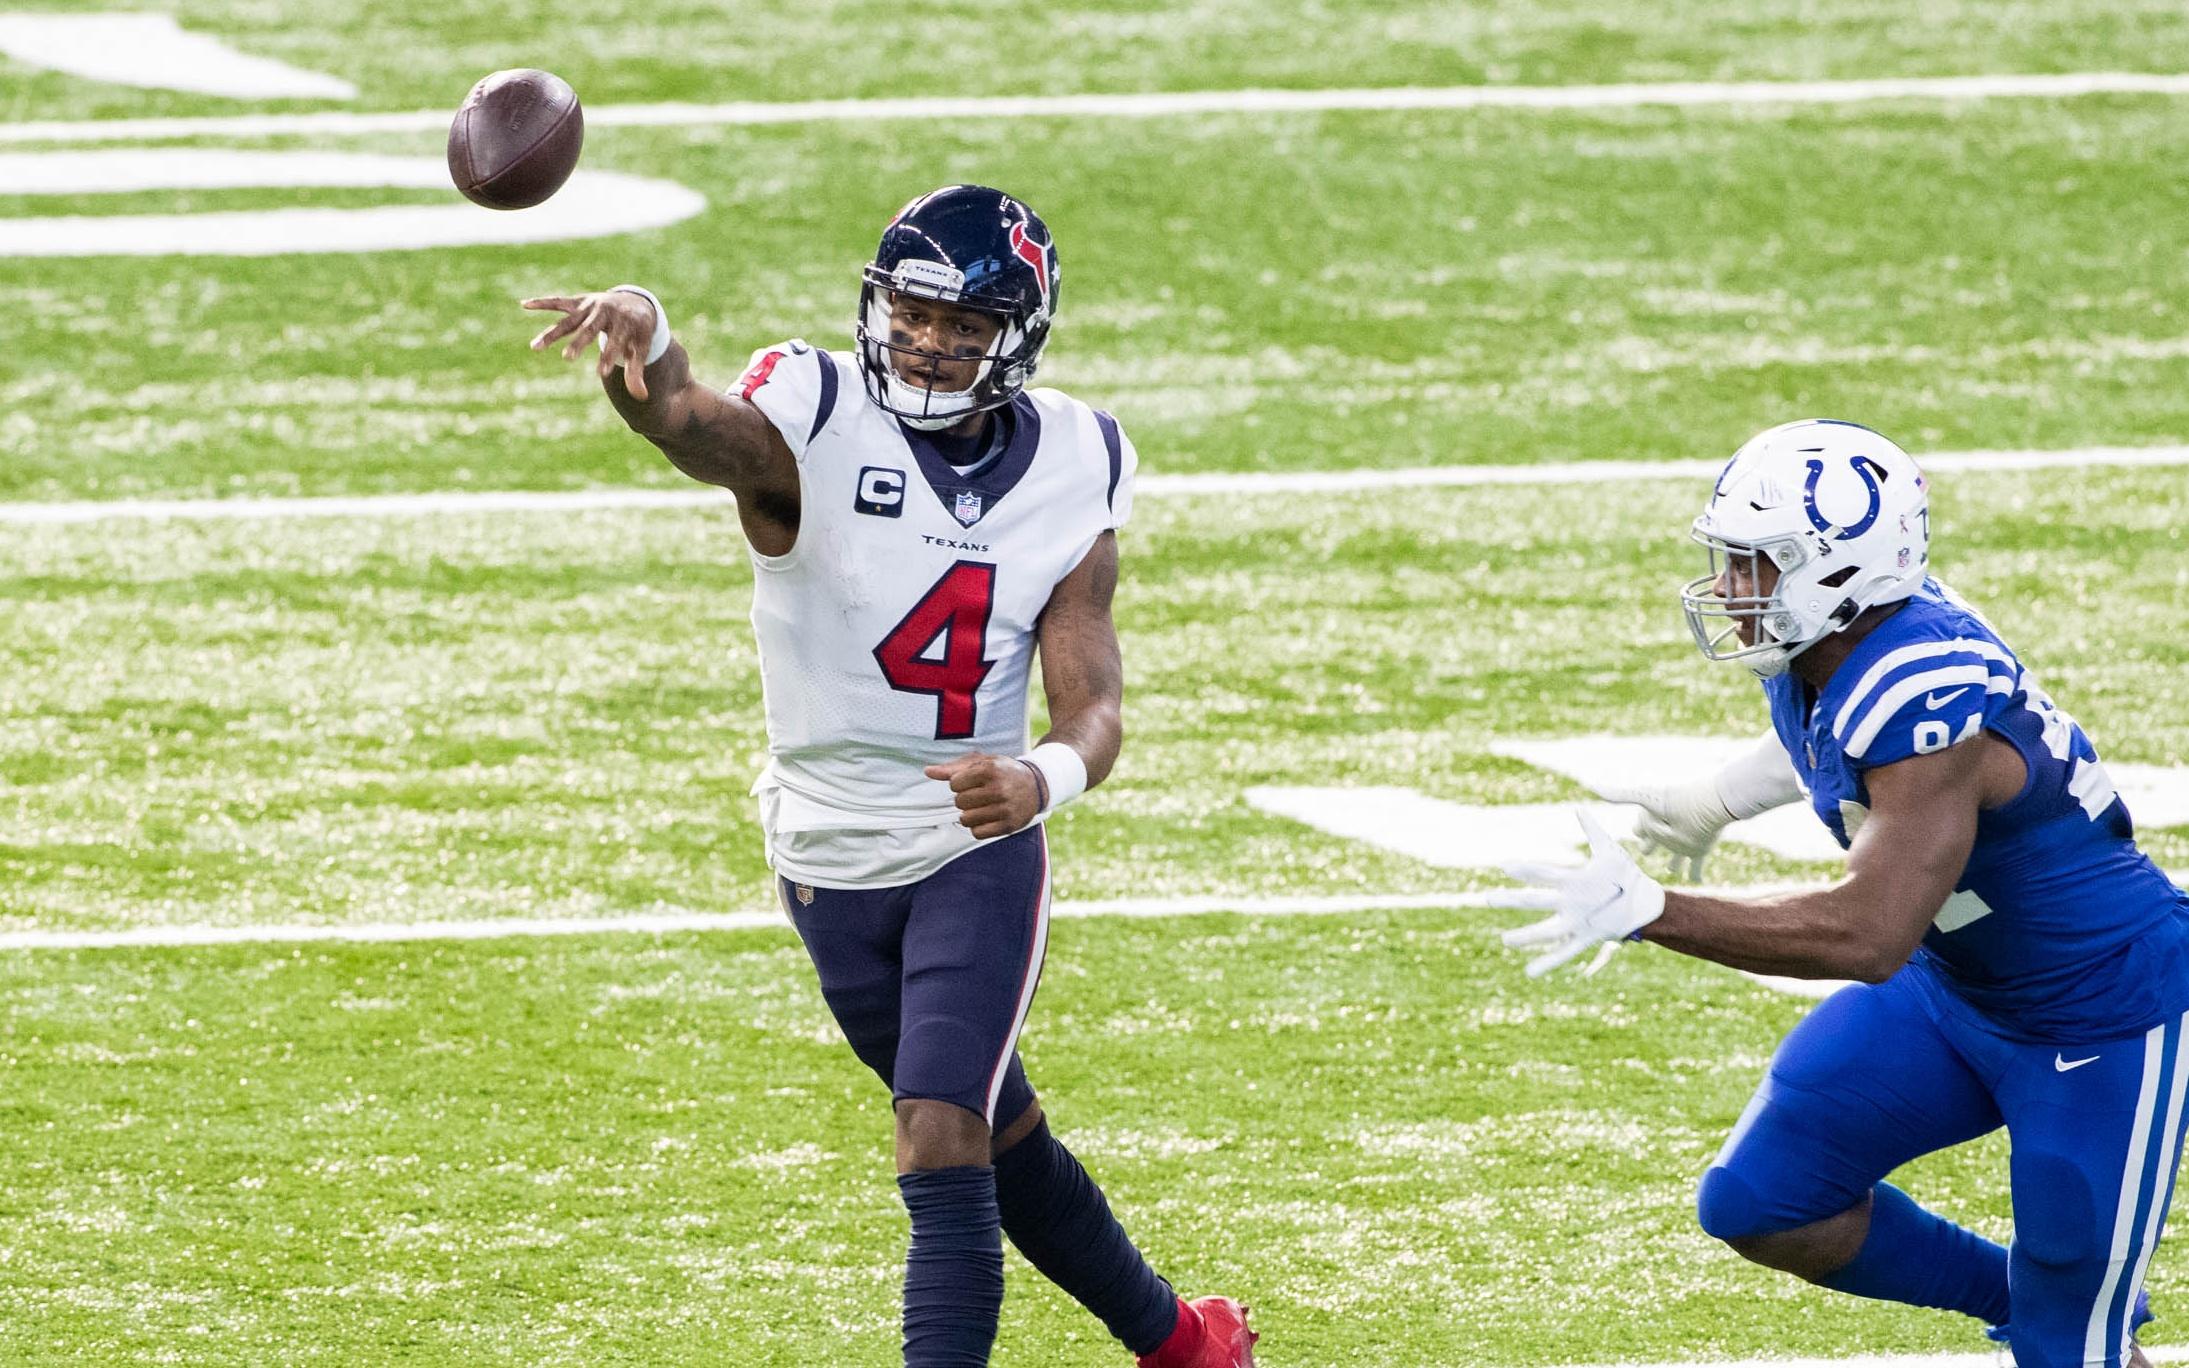 Deshaun Watson throws on the run. Credit: Trevor Ruszkowski, USA TODAY Sports.